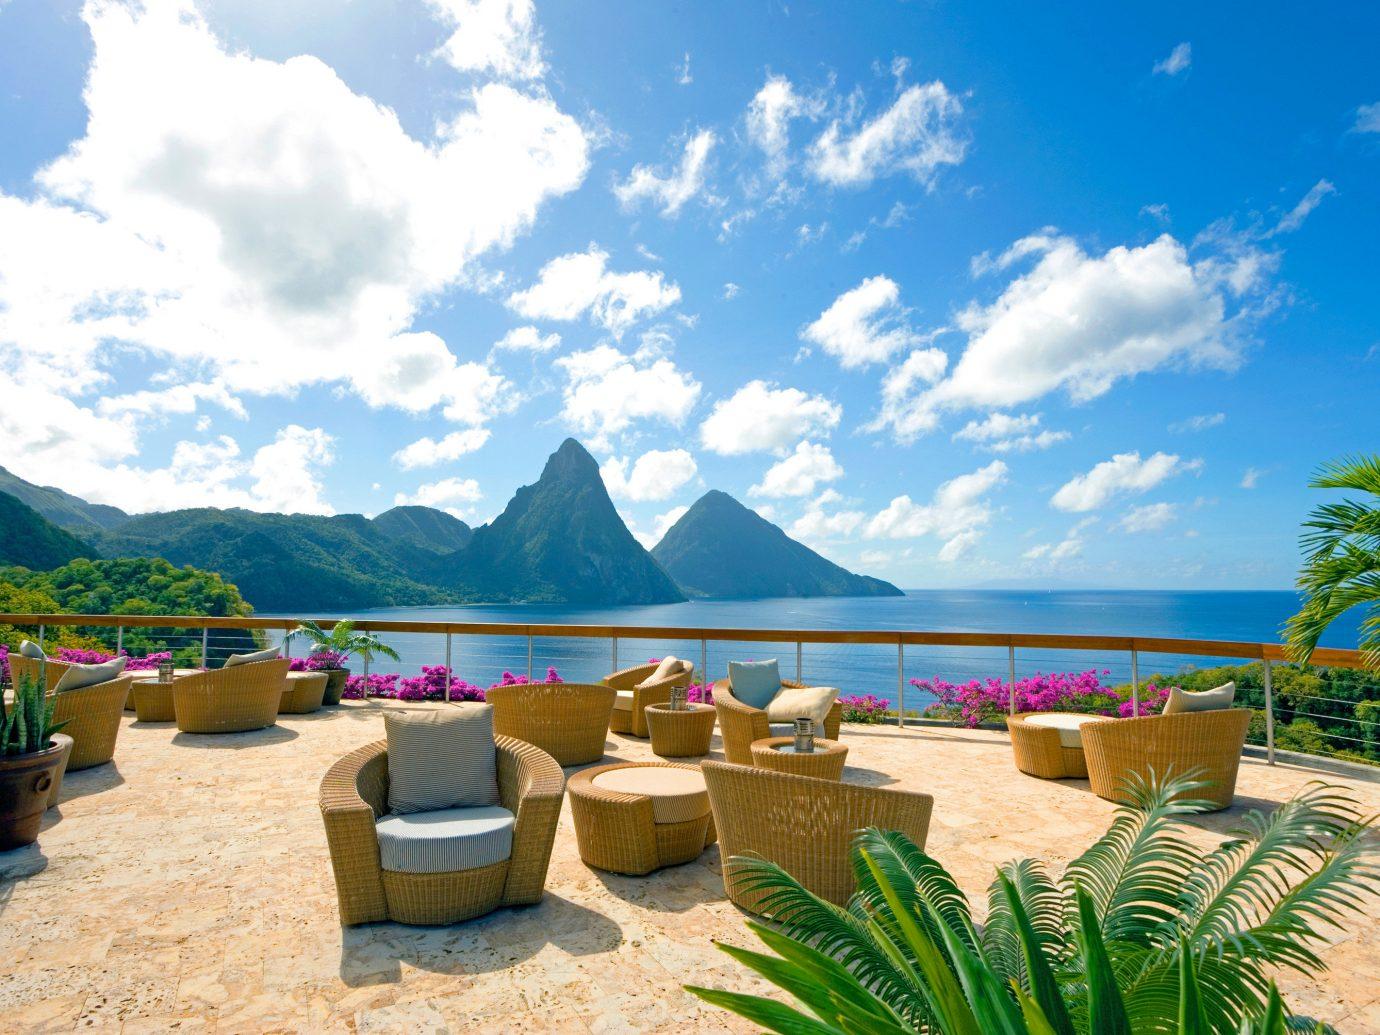 Hotels Romance sky outdoor leisure property Resort swimming pool vacation Beach caribbean estate bay Sea Villa furniture day